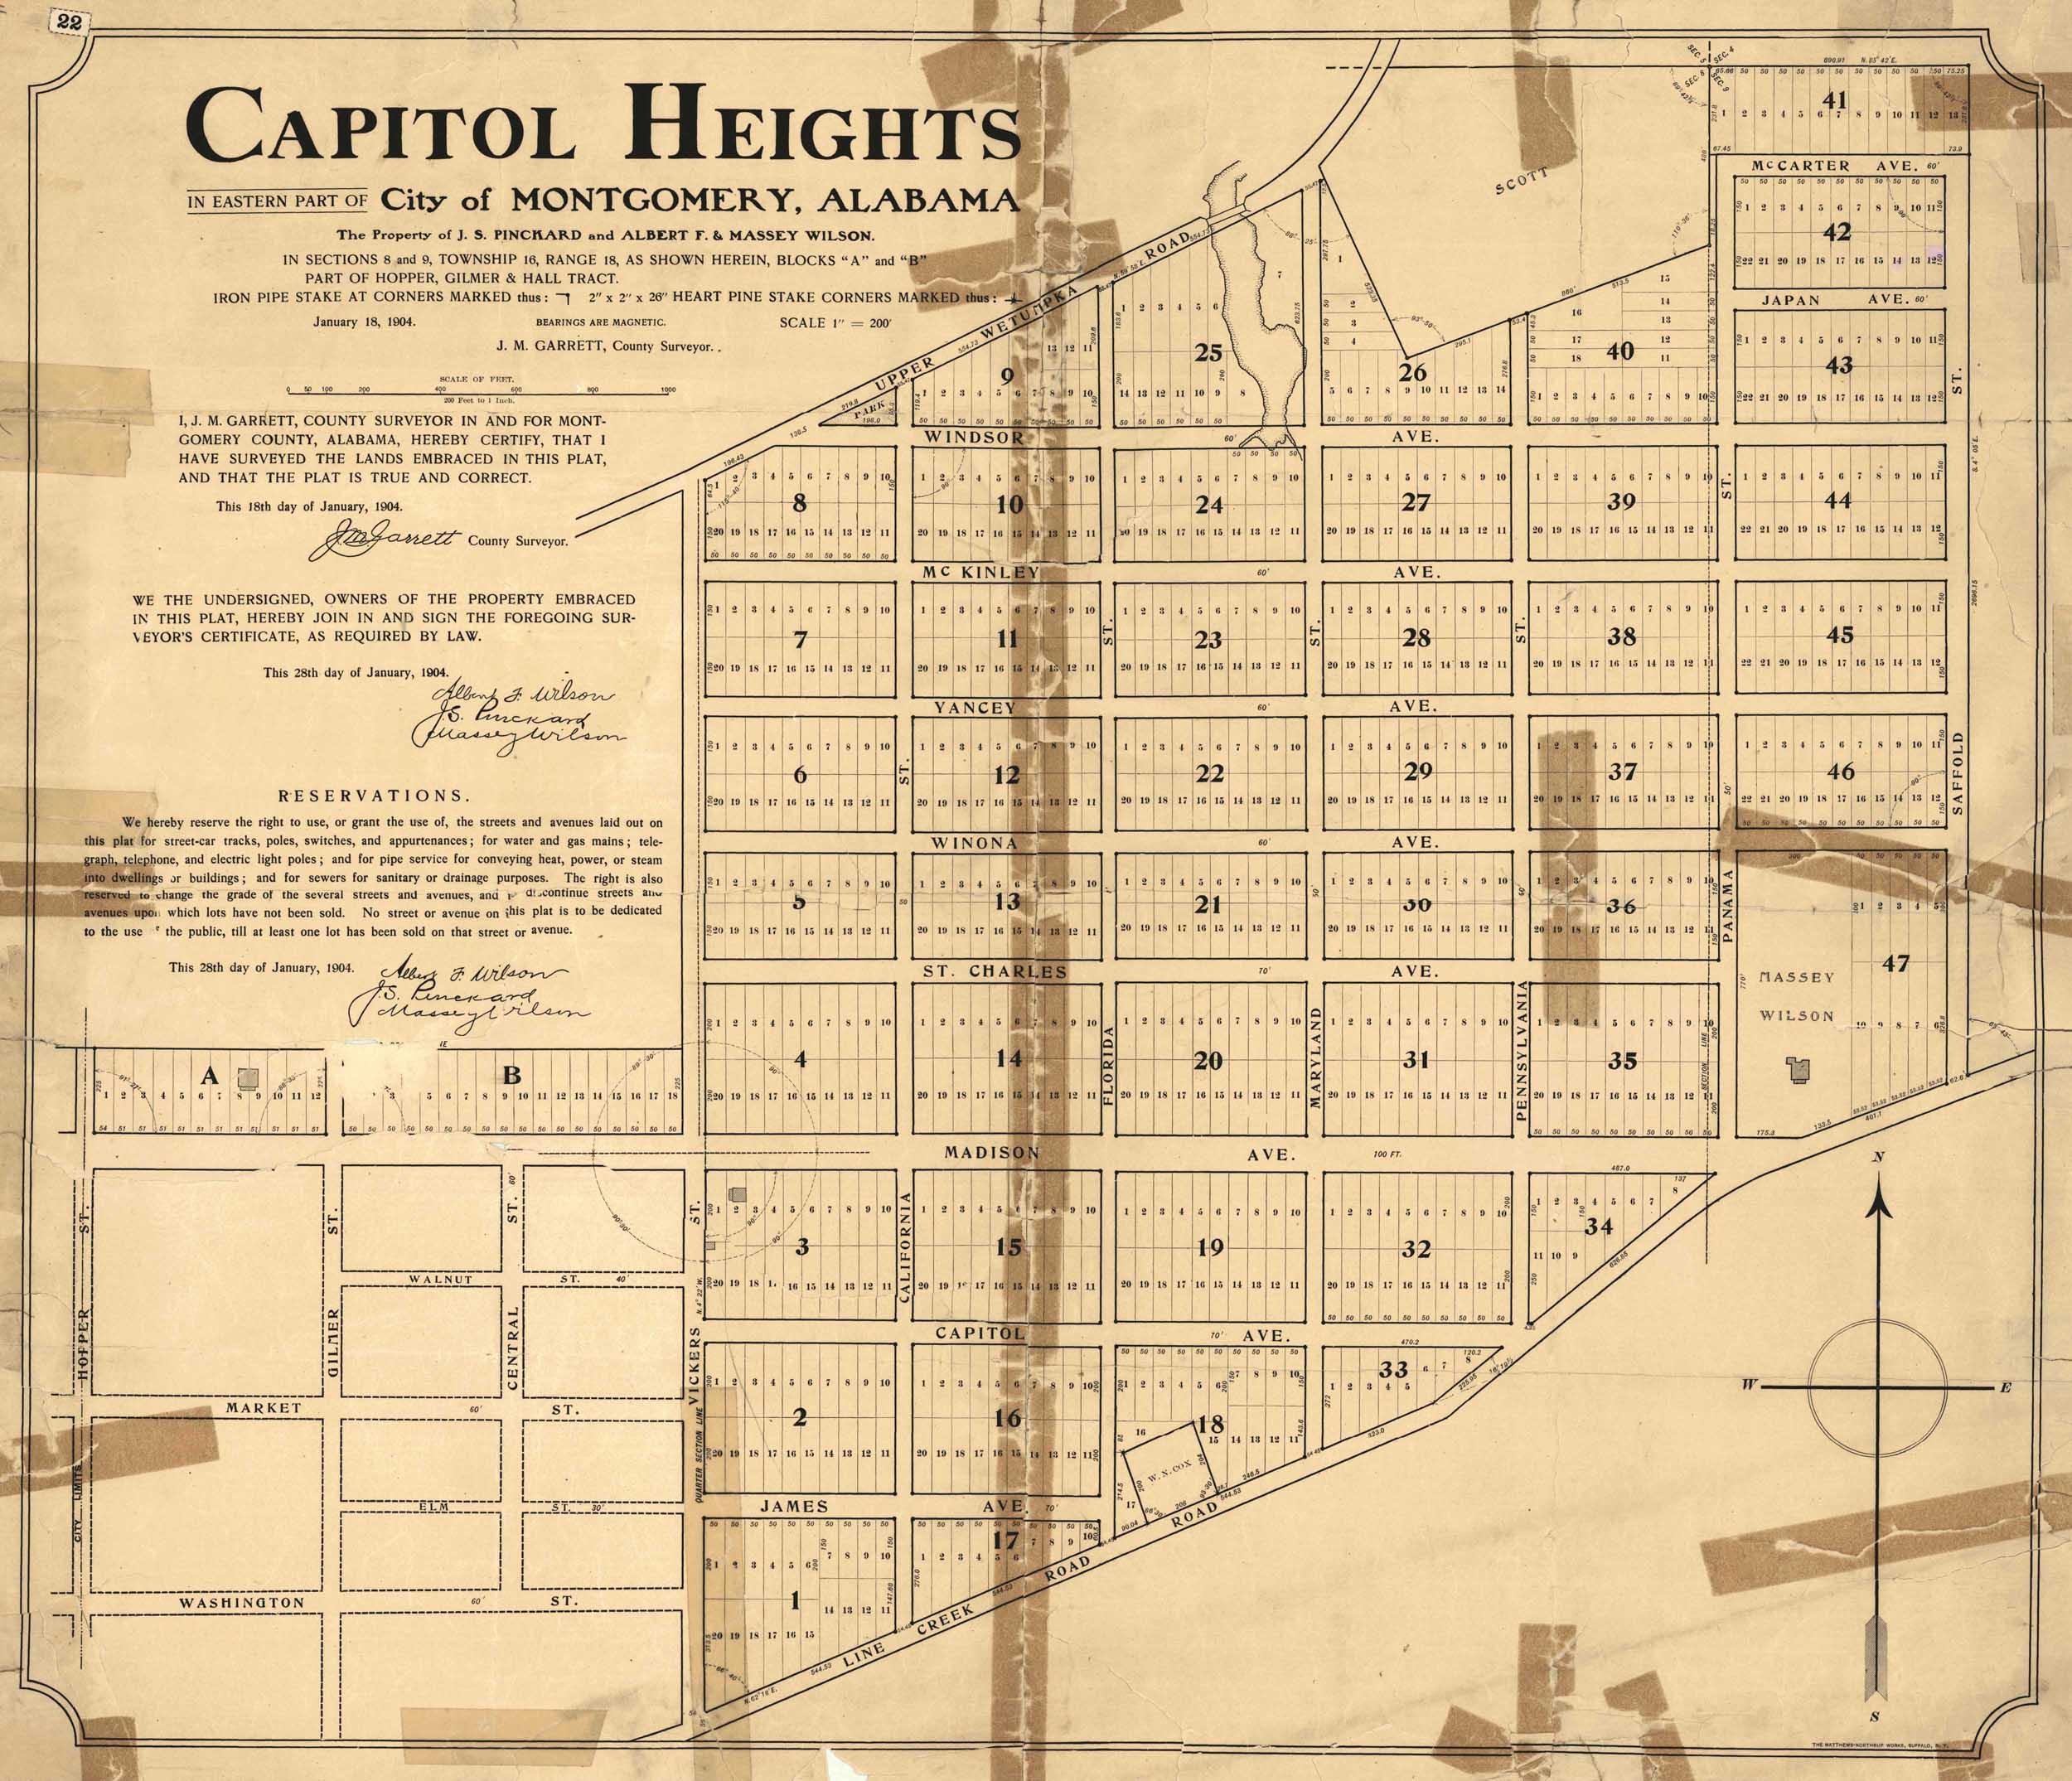 File:1904 map of Capitol Heights, Montgomery, Alabama.jpeg ... on omaha ne map, roanoke va map, milwaukee wi map, montgomery alabama, san antonio tx map, marion co alabama on map, phoenix az map, san diego ca map, trenton nj map, nashville tn map, richmond va map, montgomery tx map, st louis mo map, newport ri map, montgomery state map, erie pa map, augusta ga map, rochester ny map, oklahoma city ok map, providence ri map,